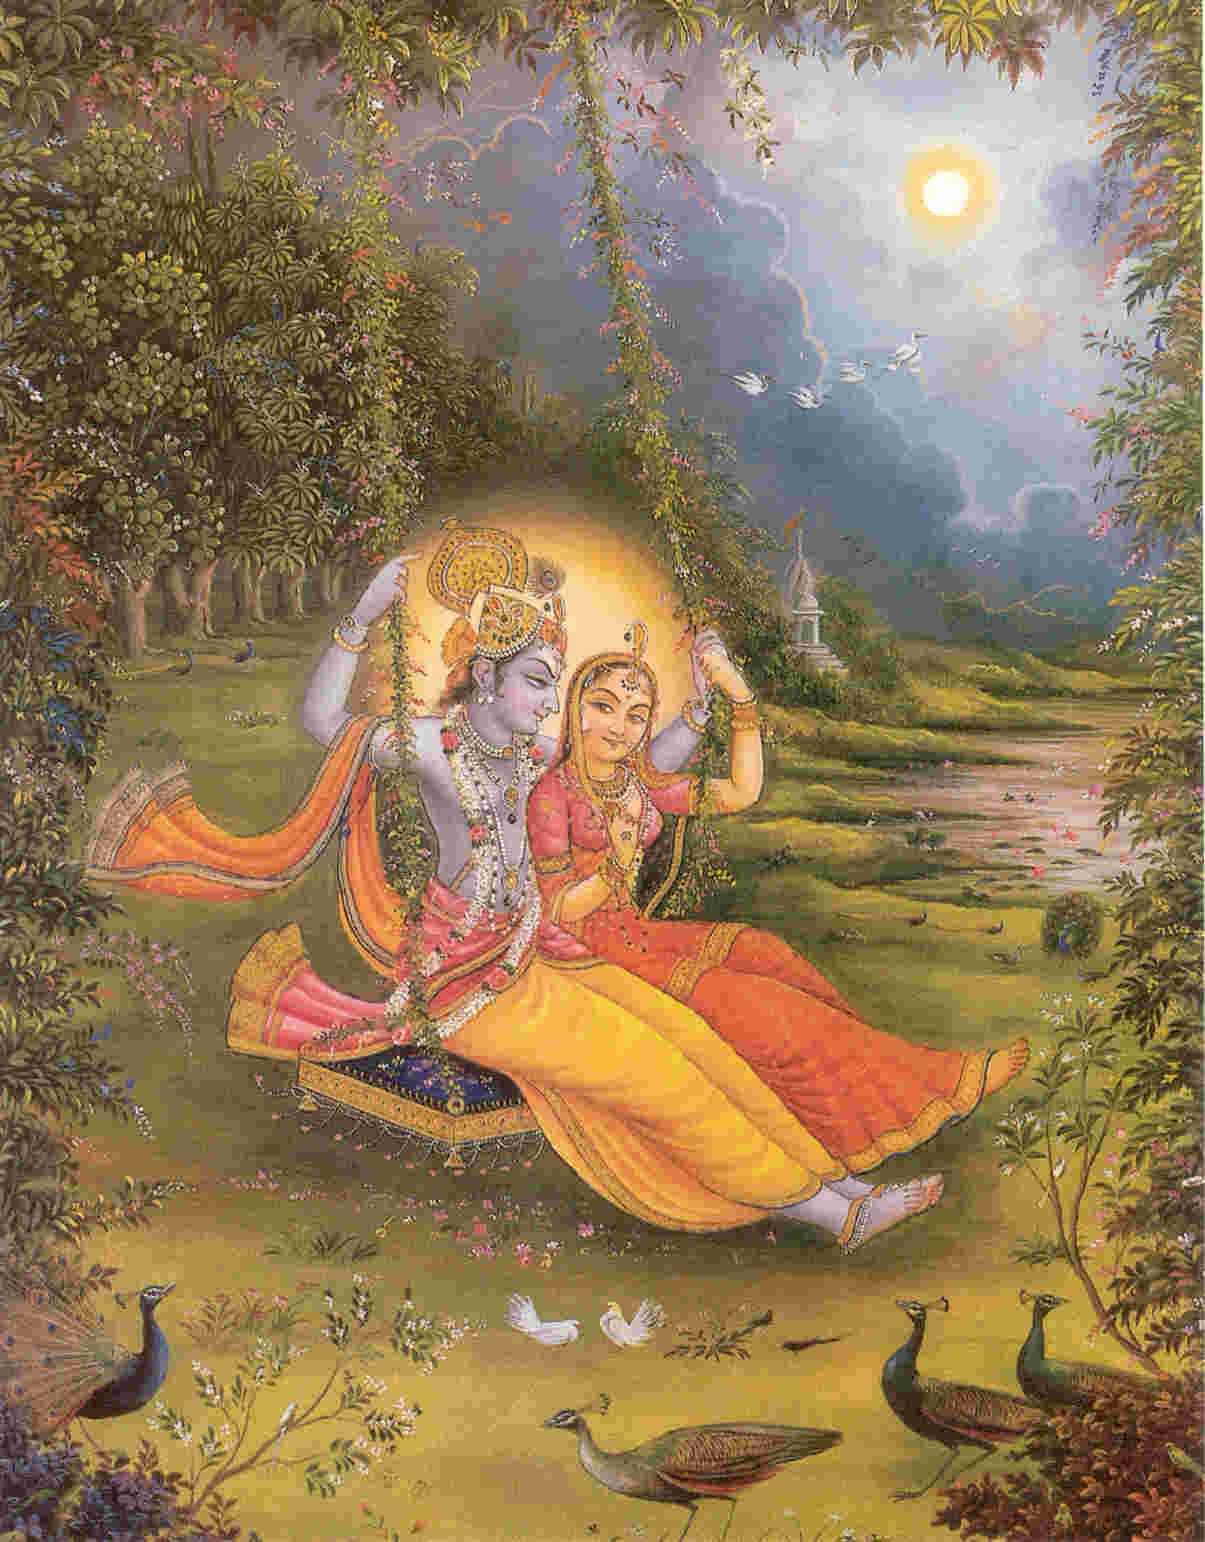 Sri Sri Radha and Krishna on a swing